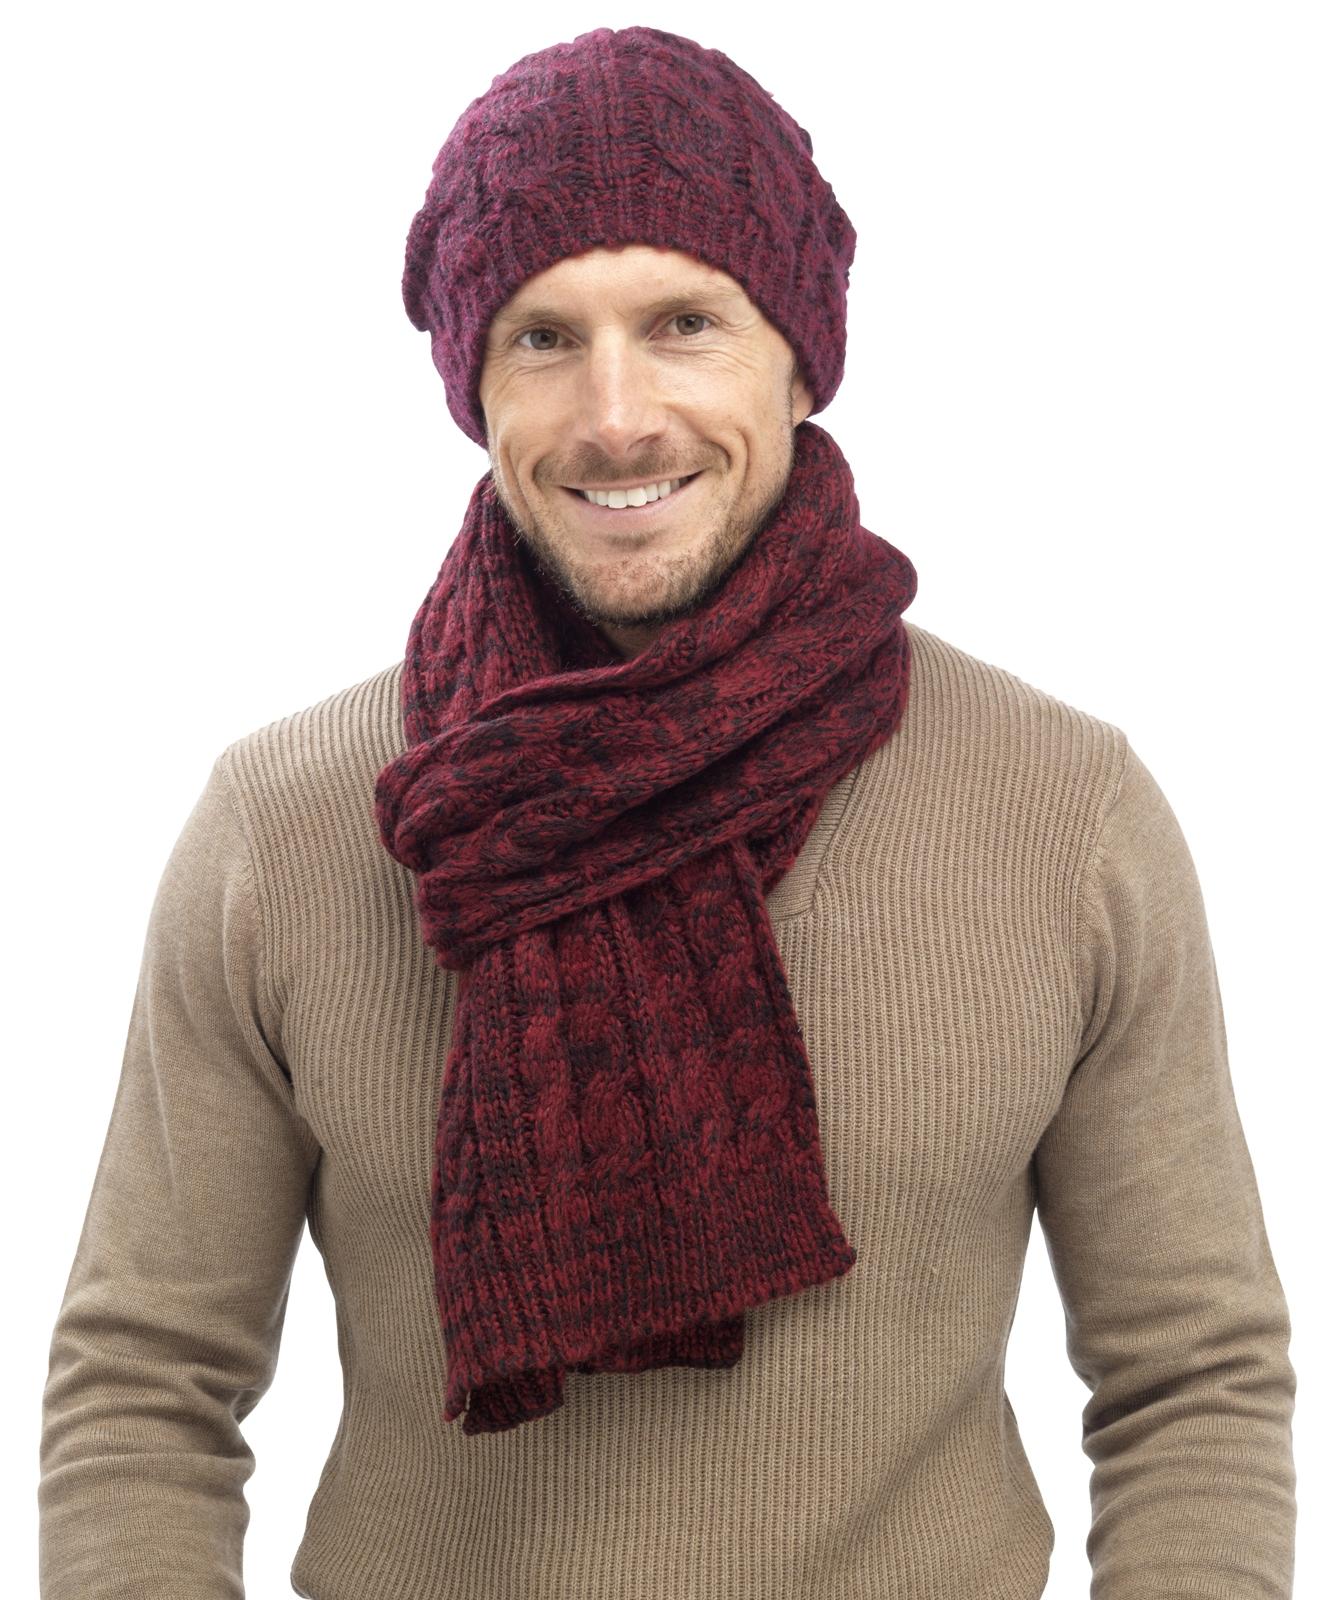 Mens Bobble Hat Knitting Pattern : Mens Luxury Fairisle Cable Knit Slouch Beanie Bobble Hat ...